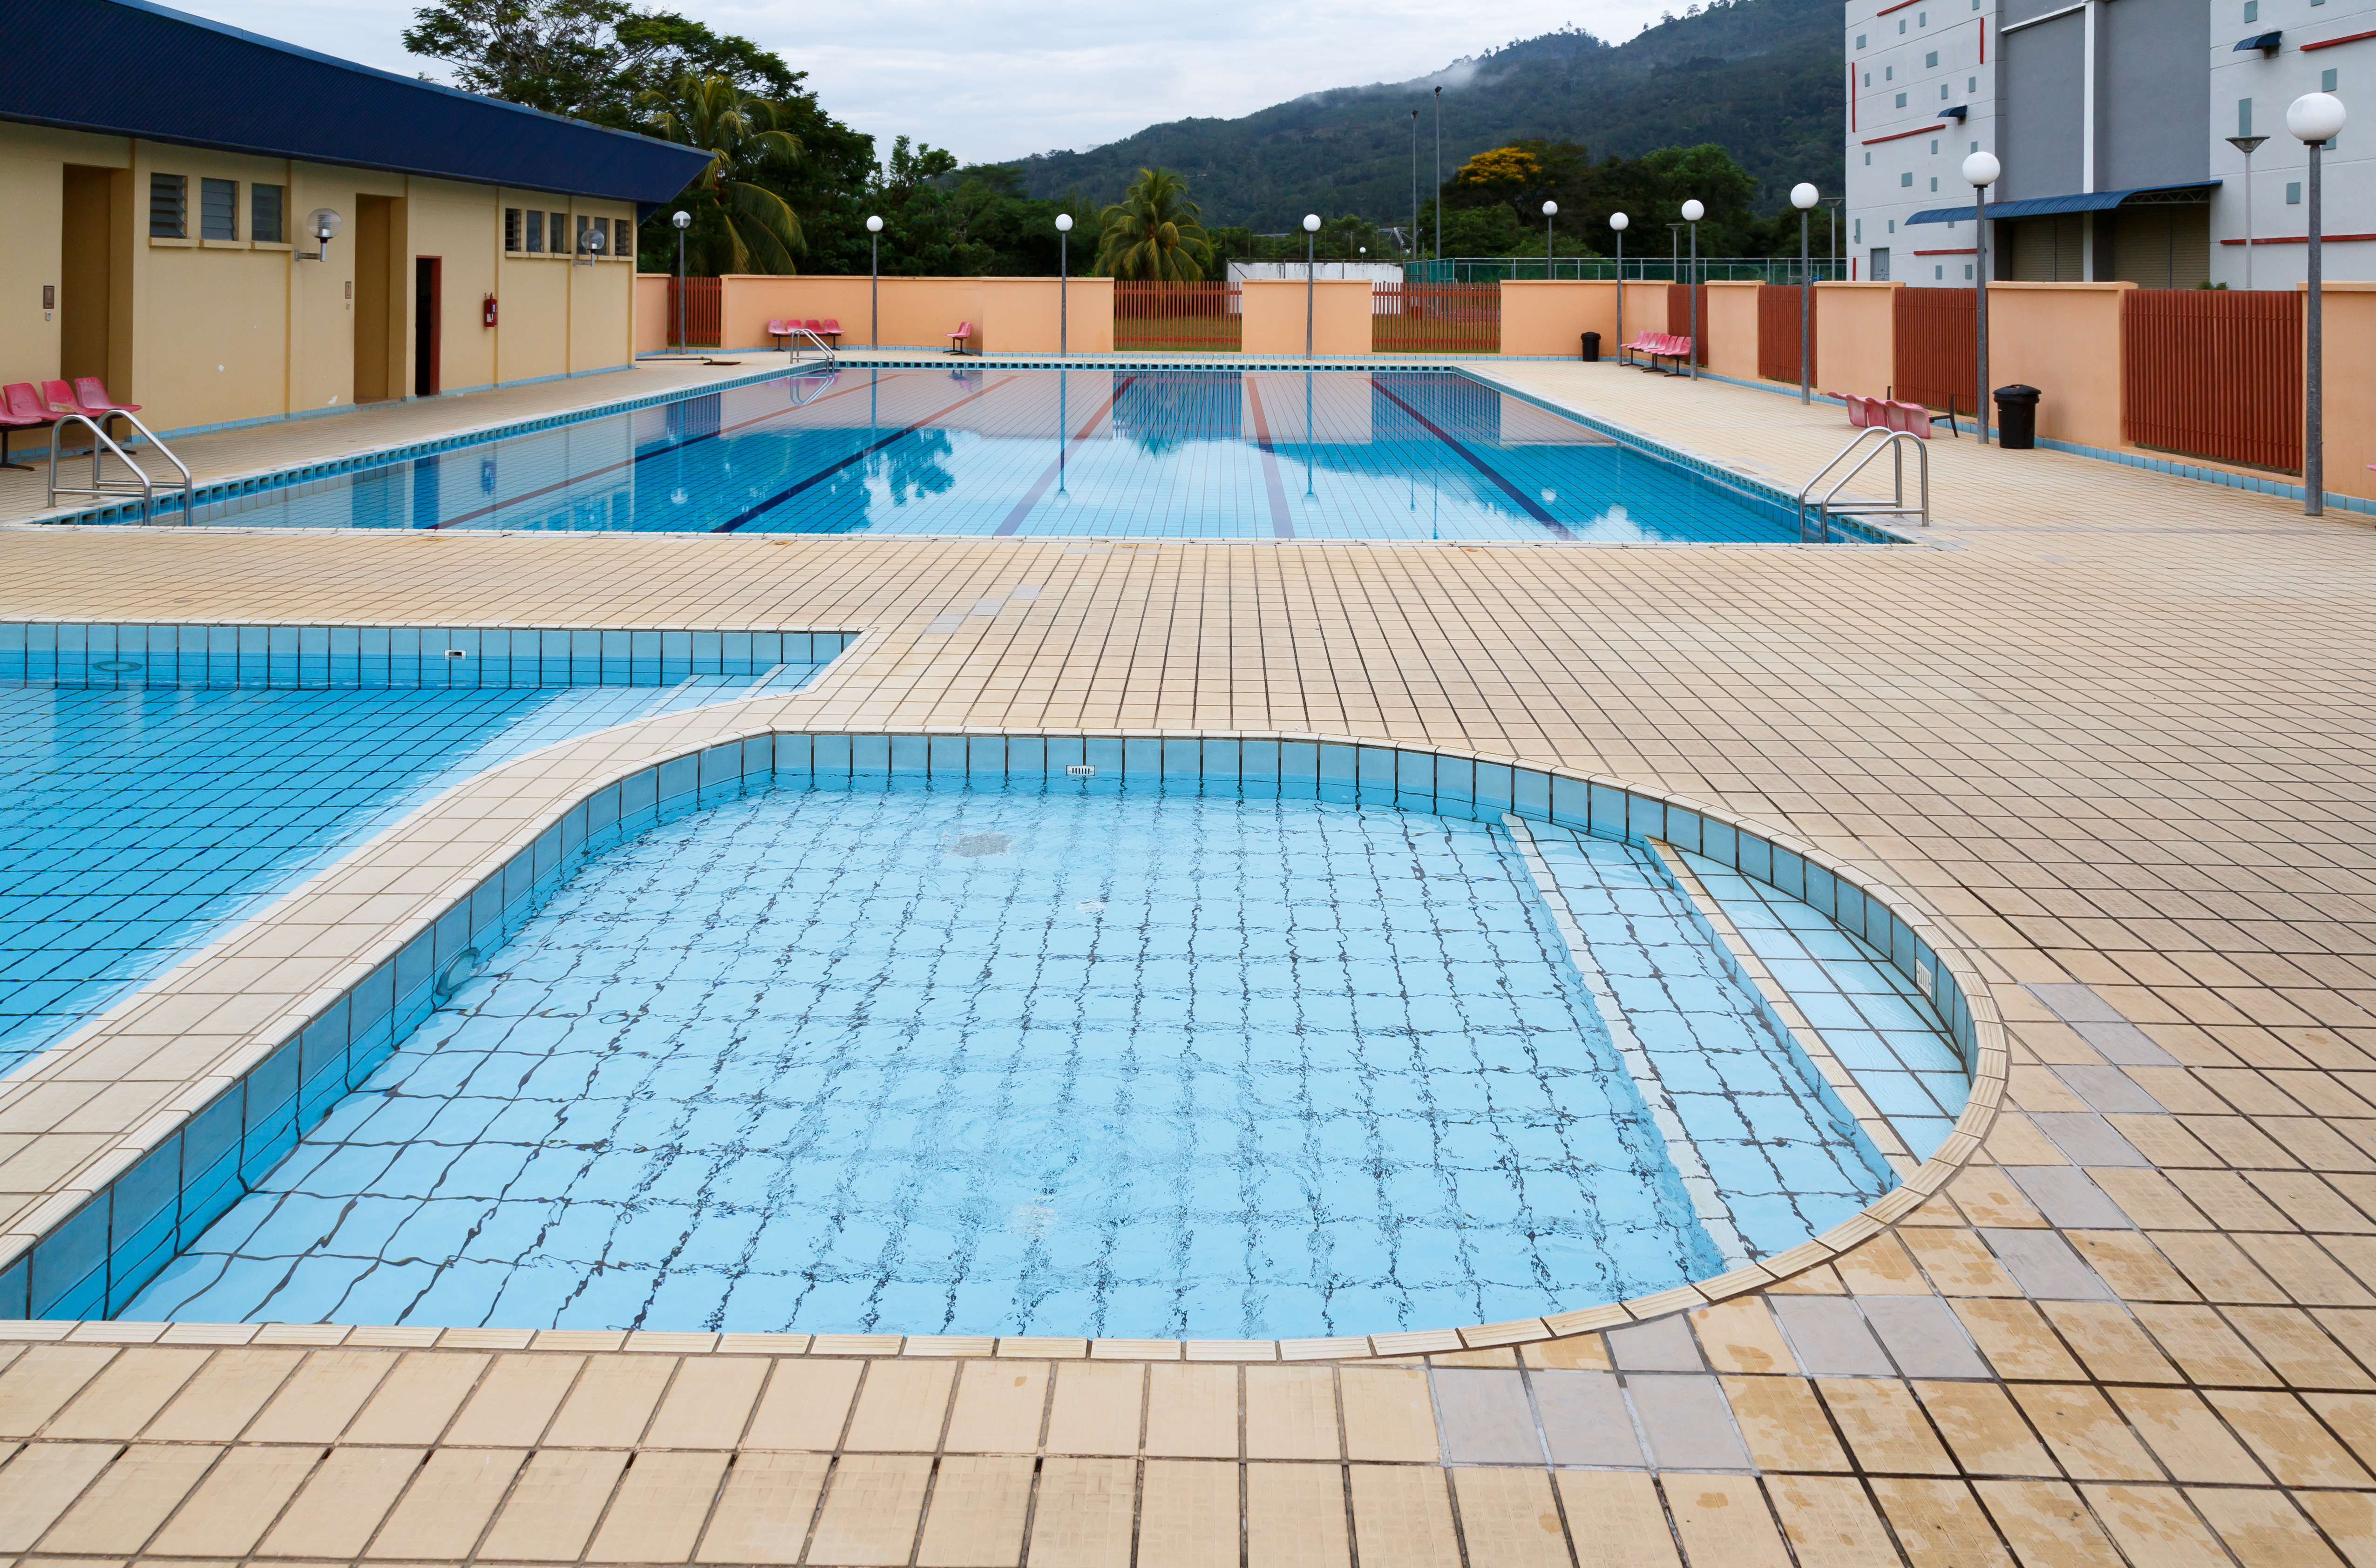 File:Tenom Sabah Outdoor-Swimming-Pool-10.jpg - Wikimedia Commons